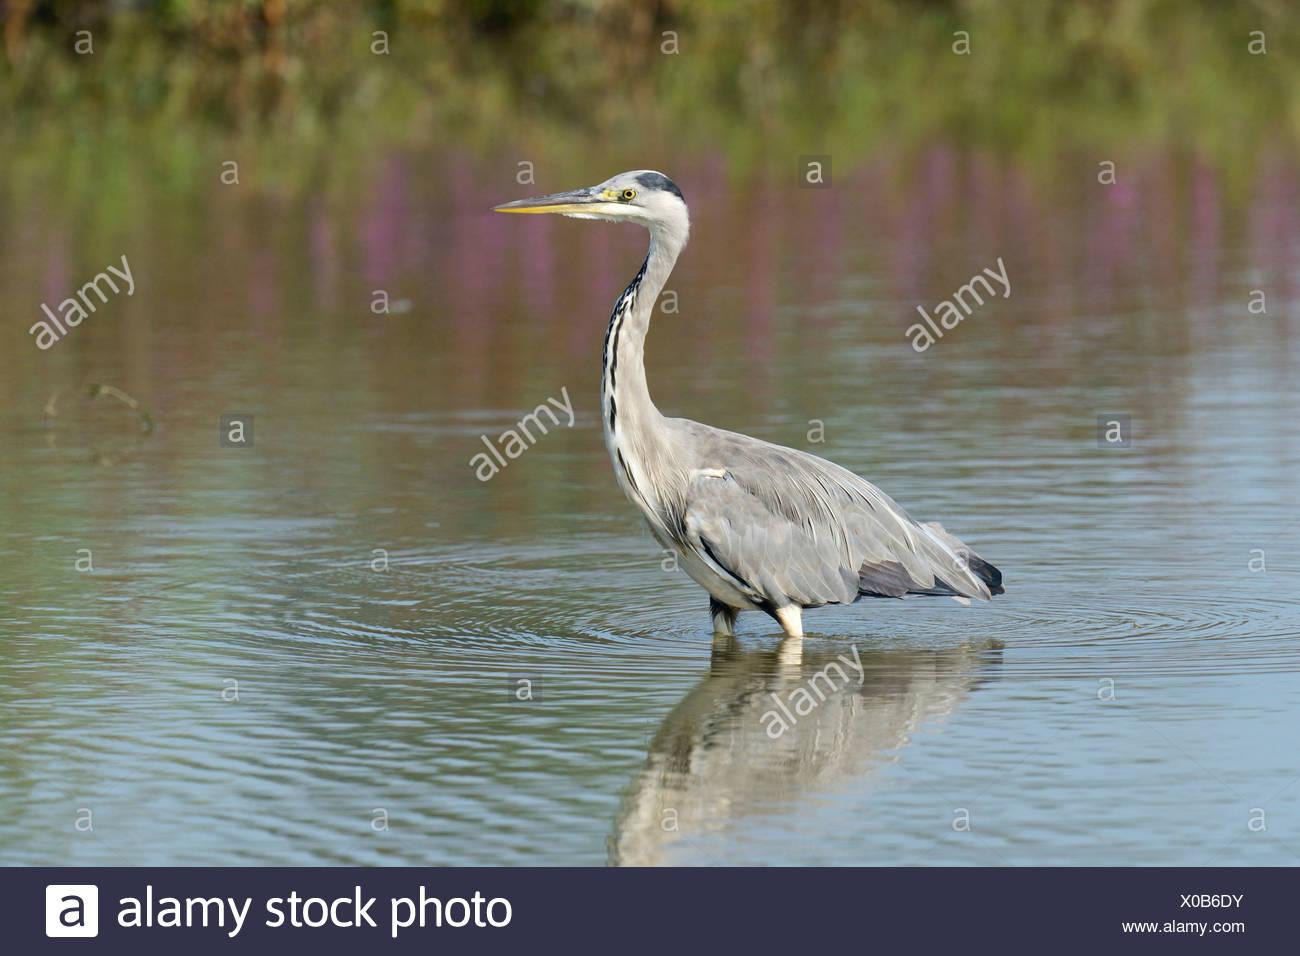 Grey Heron (Ardea cinerea), seeking fish, Maschwanden, Canton of Zurich, Switzerland - Stock Image